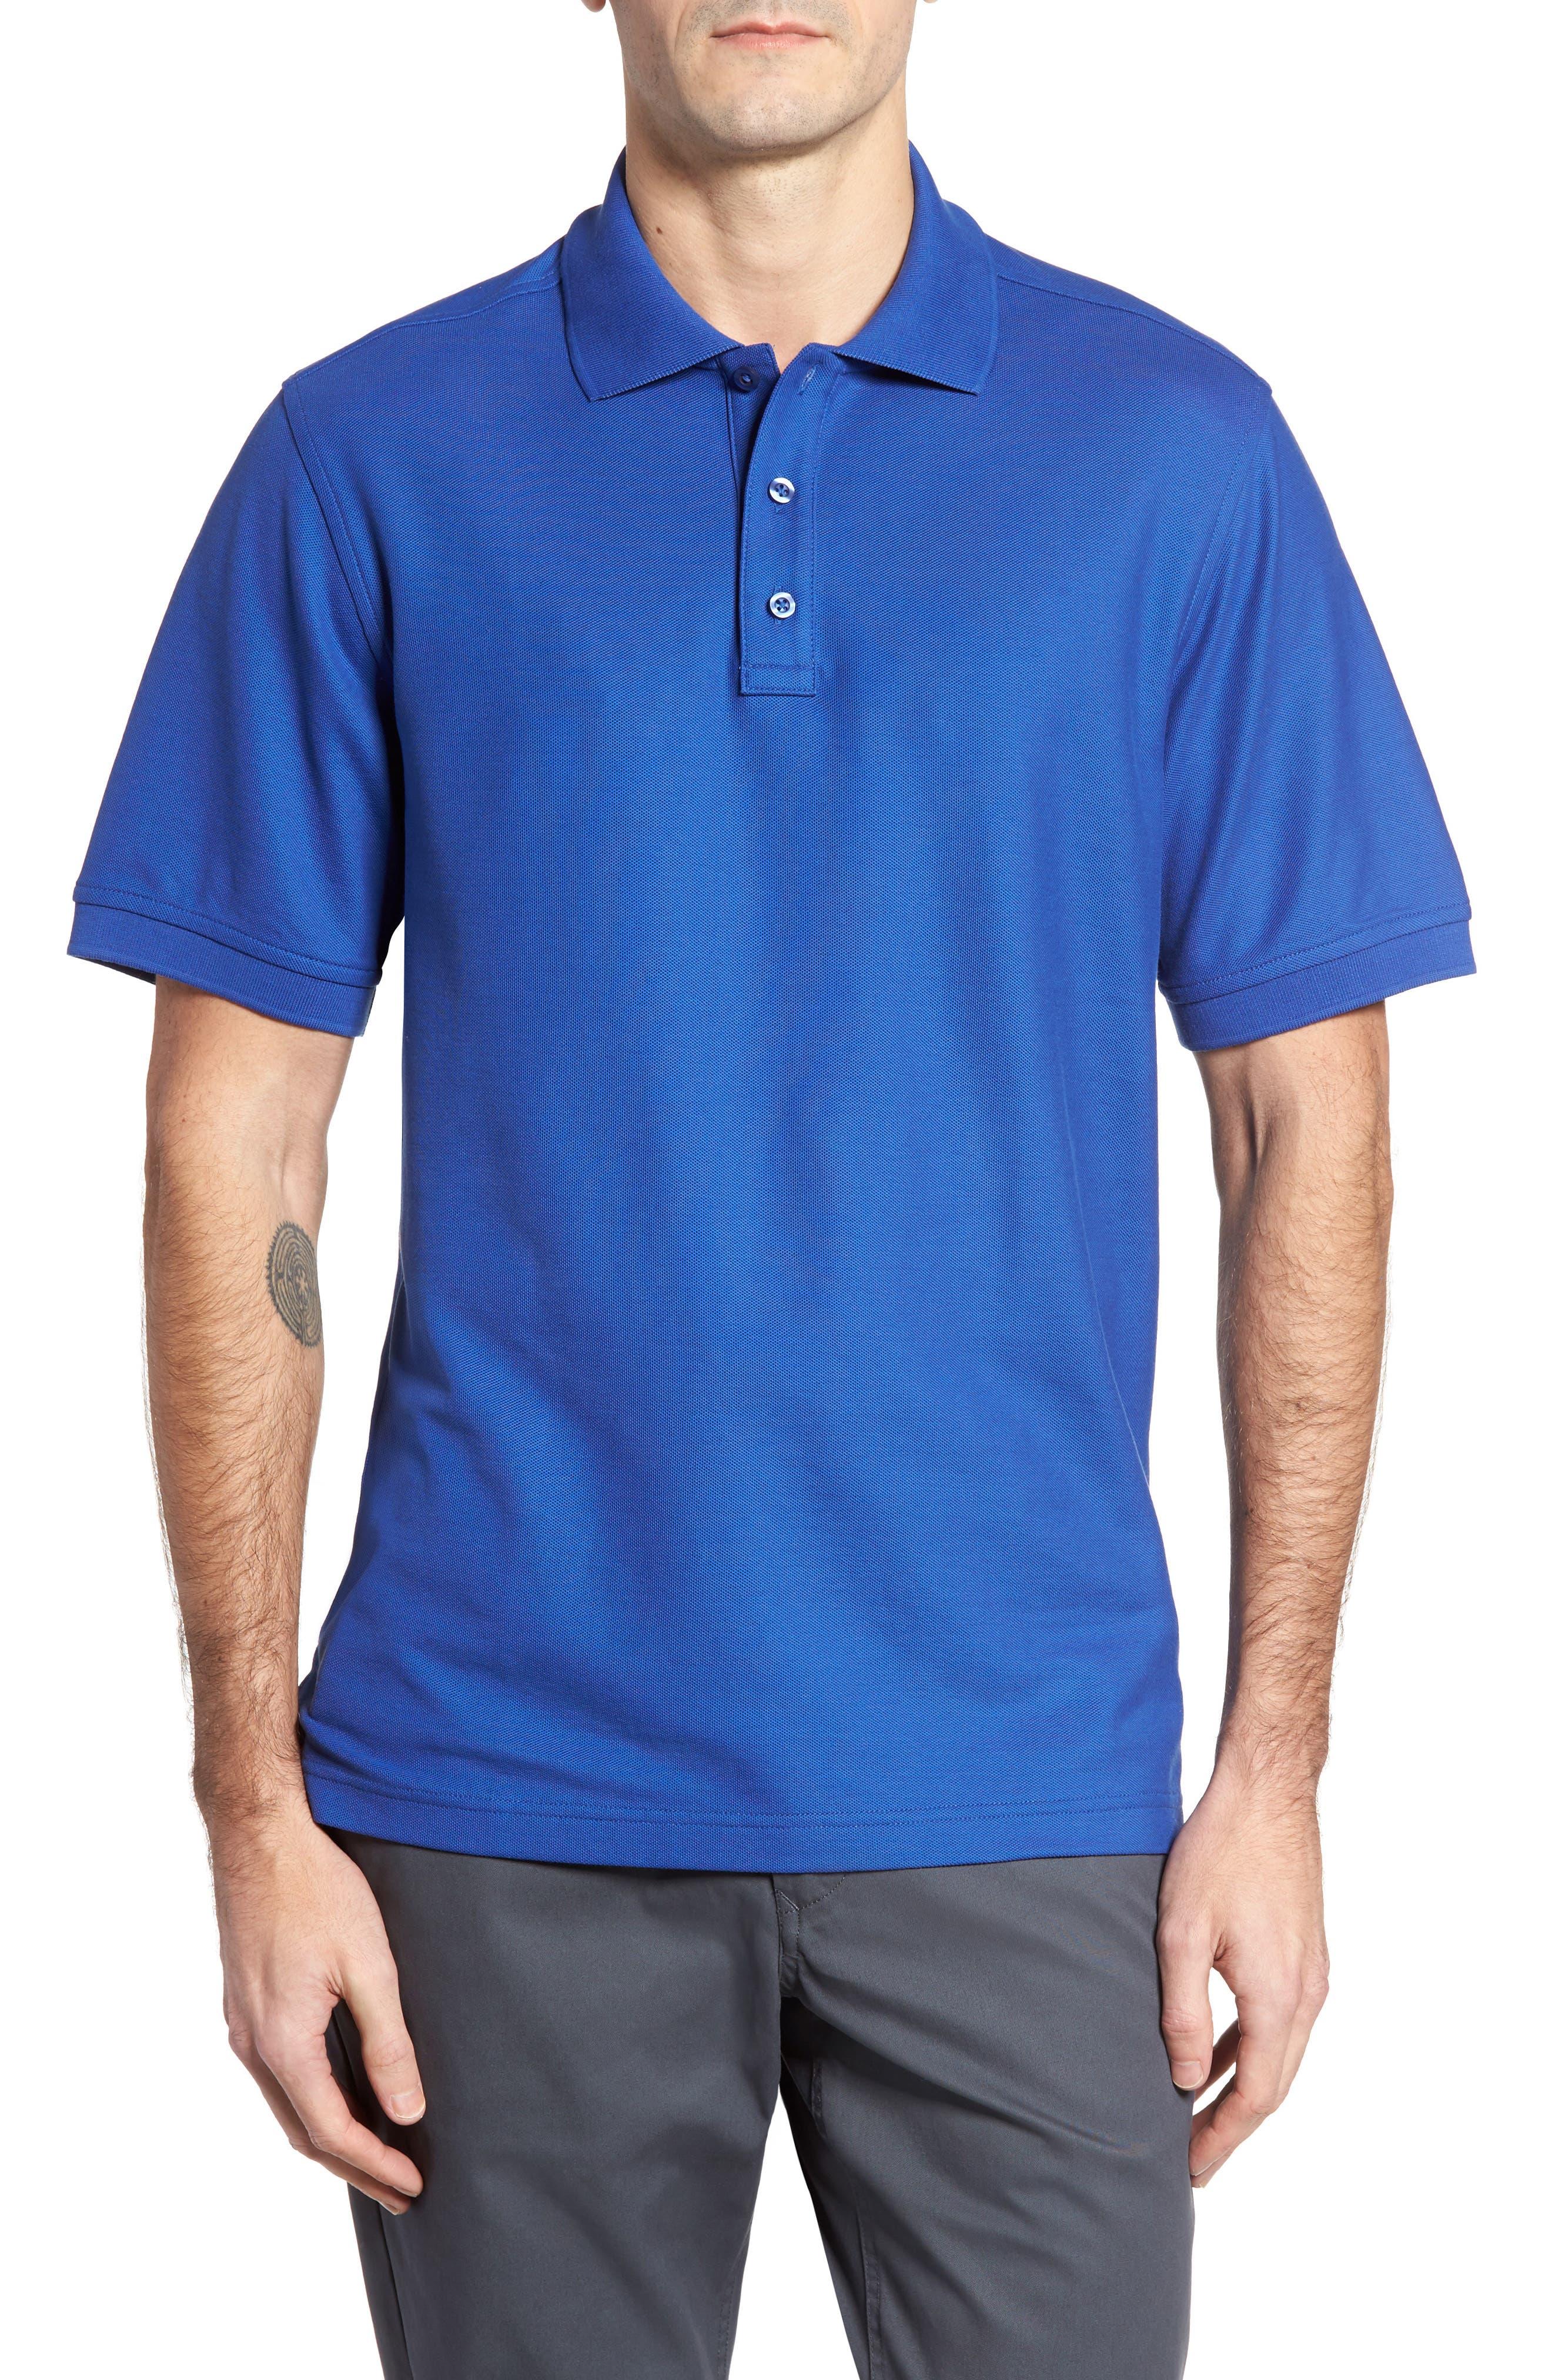 Main Image - Nordstrom Men's Shop 'Classic' Regular Fit Piqué Polo (Big)